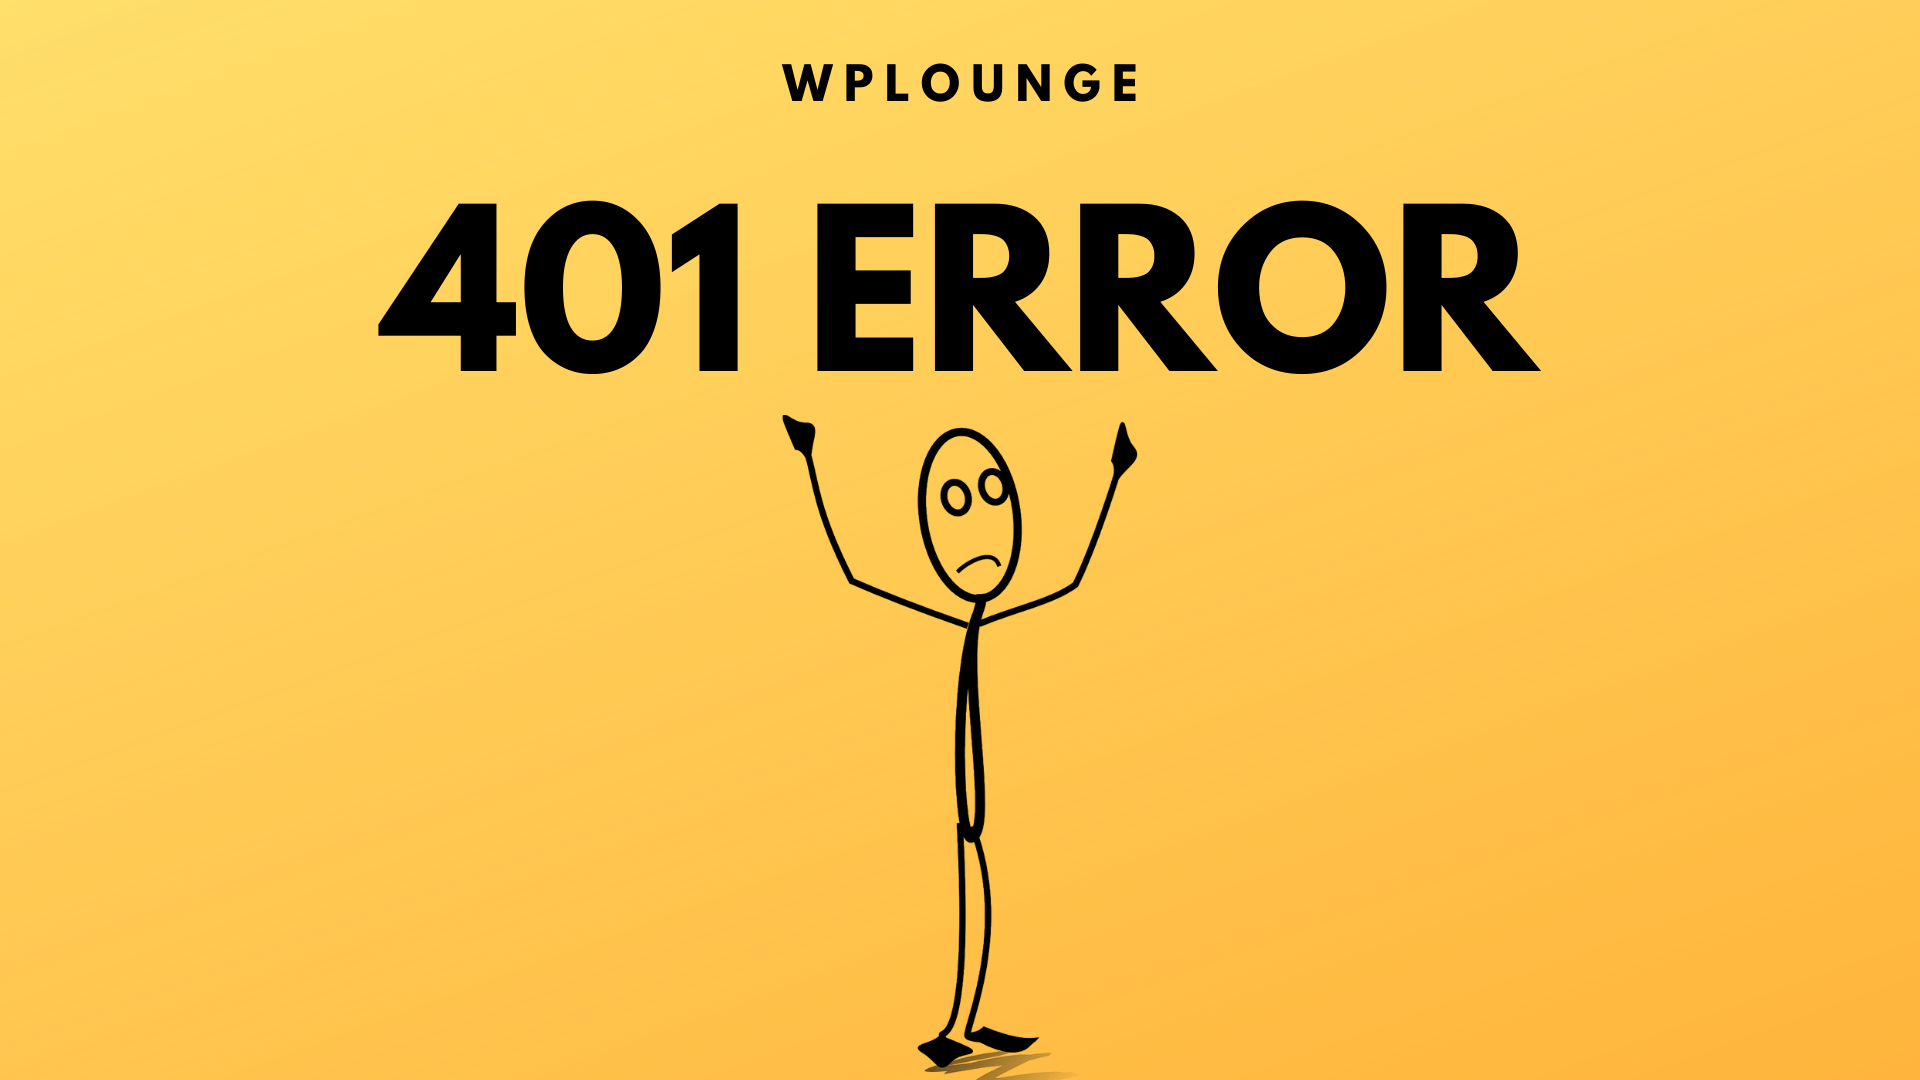 401 Error WPLounge